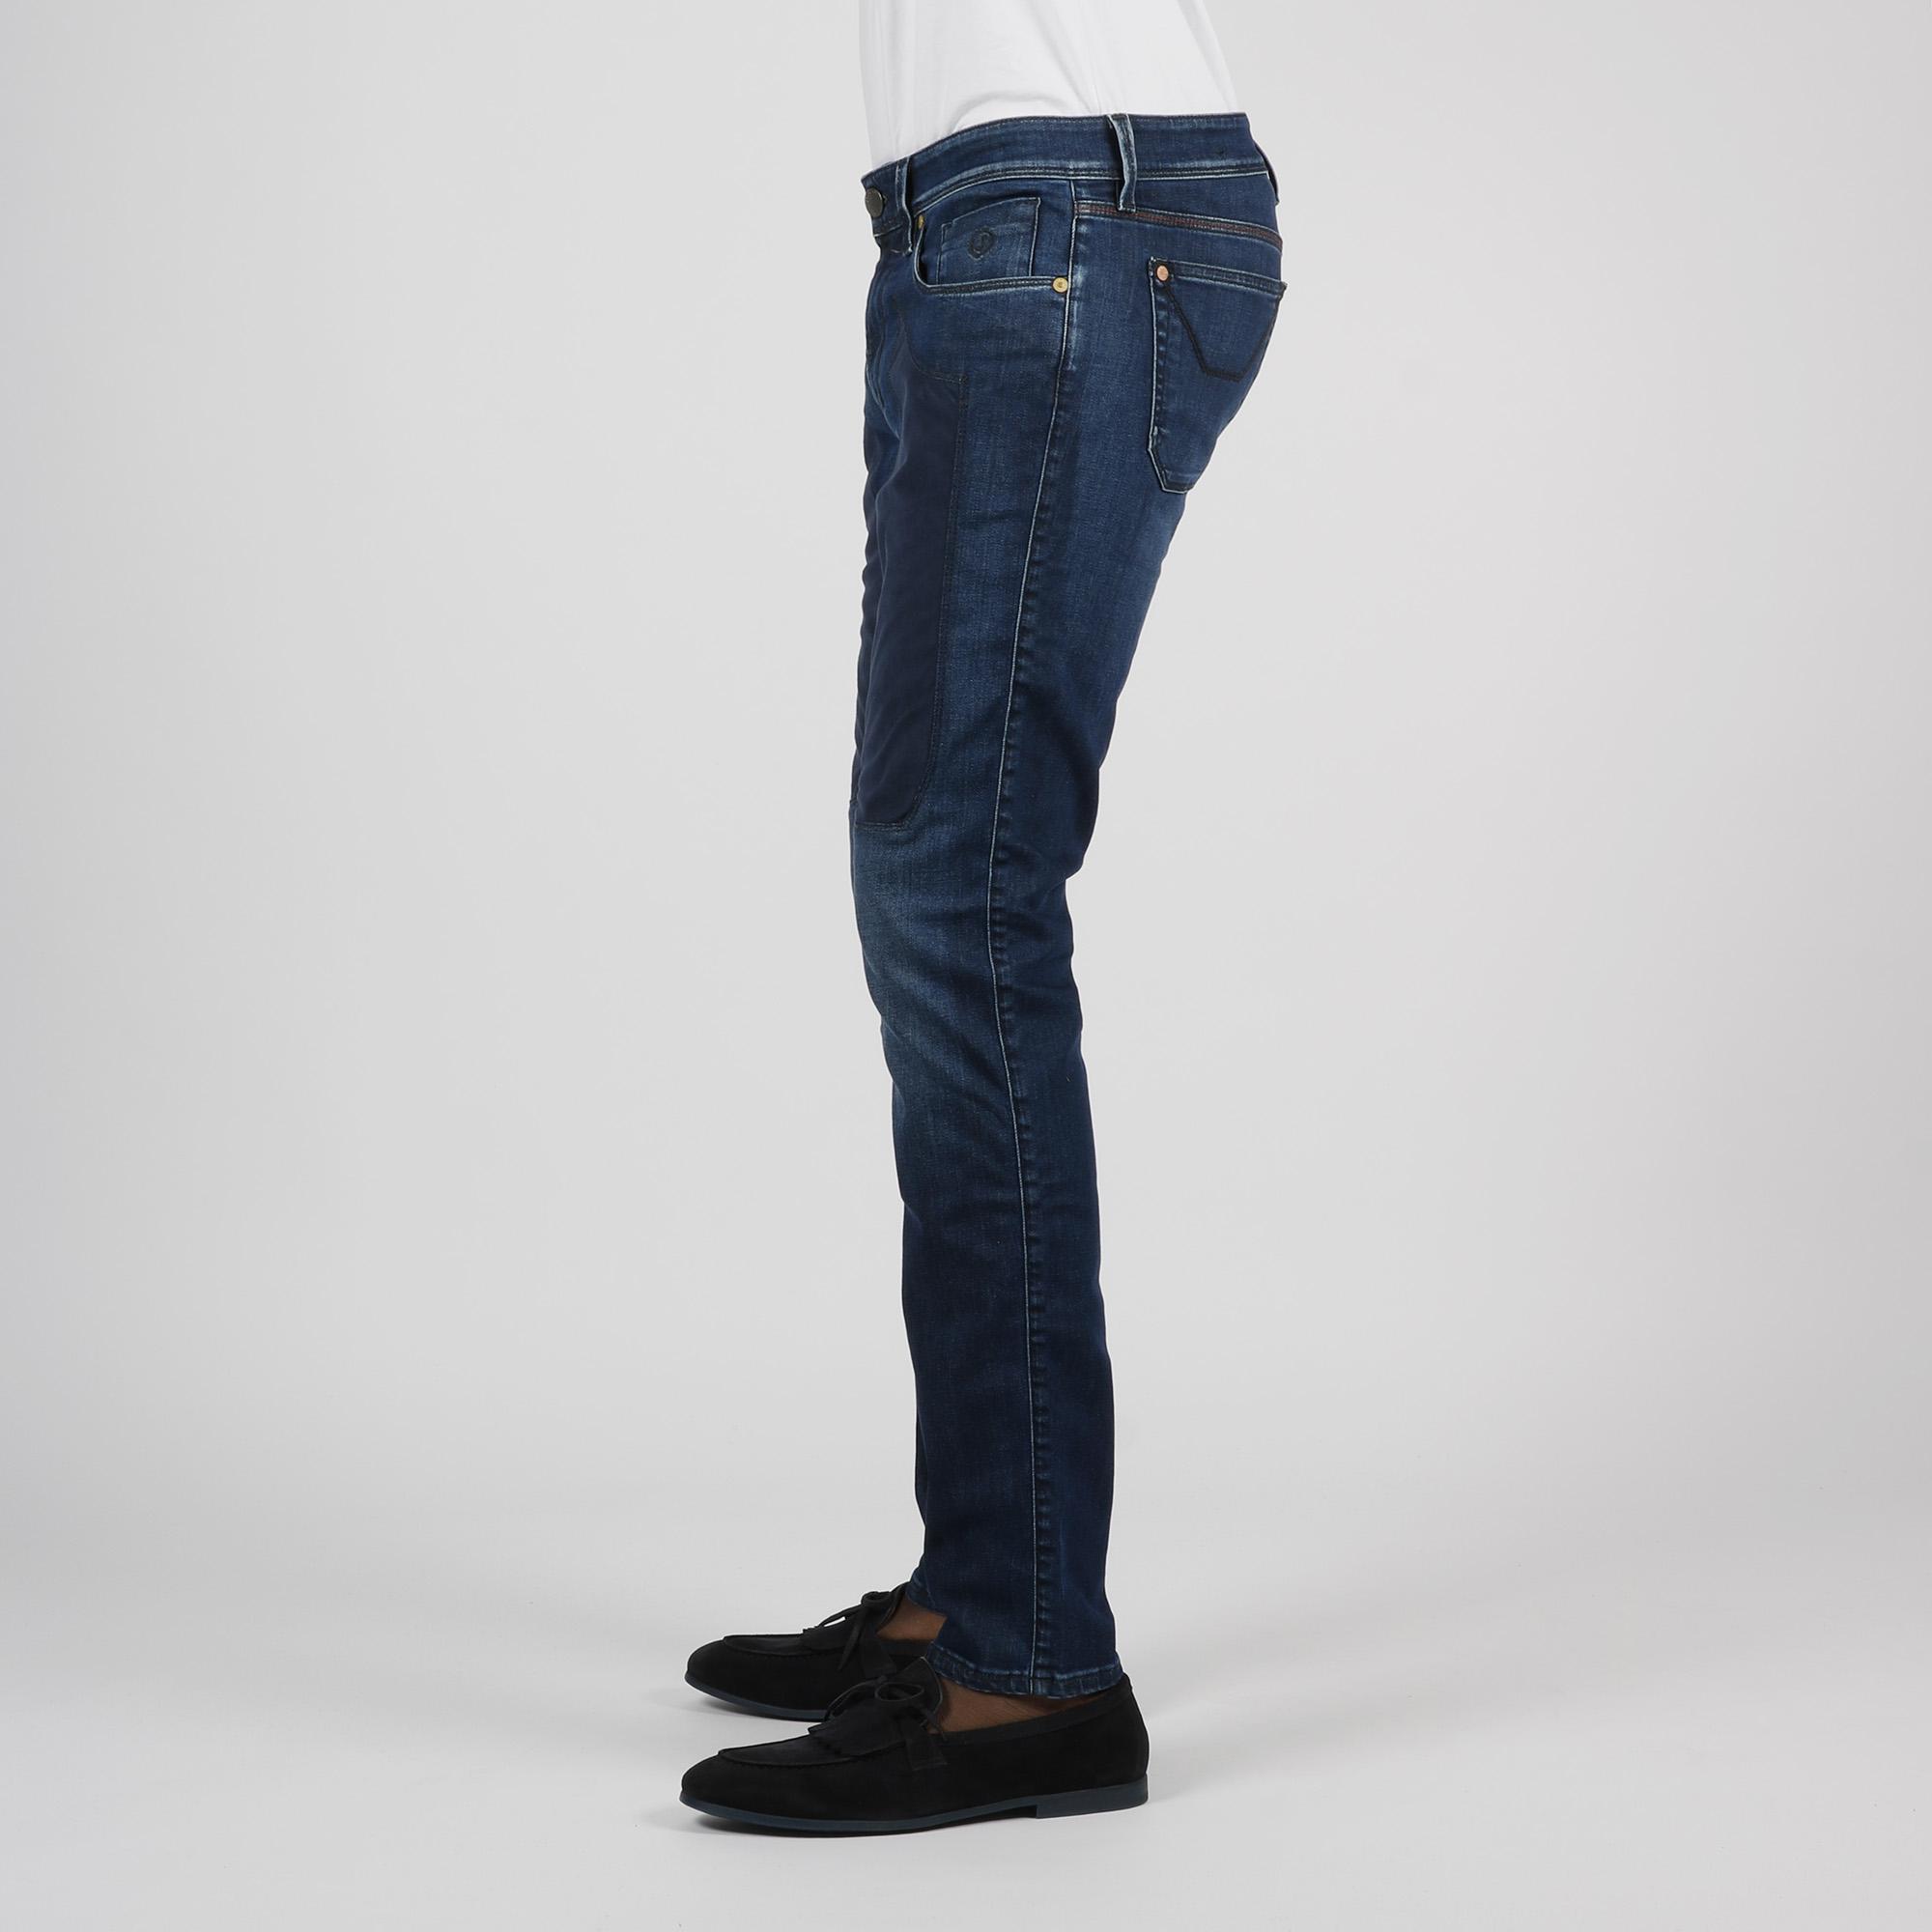 Jeans toppa alcantara - Denim scuro